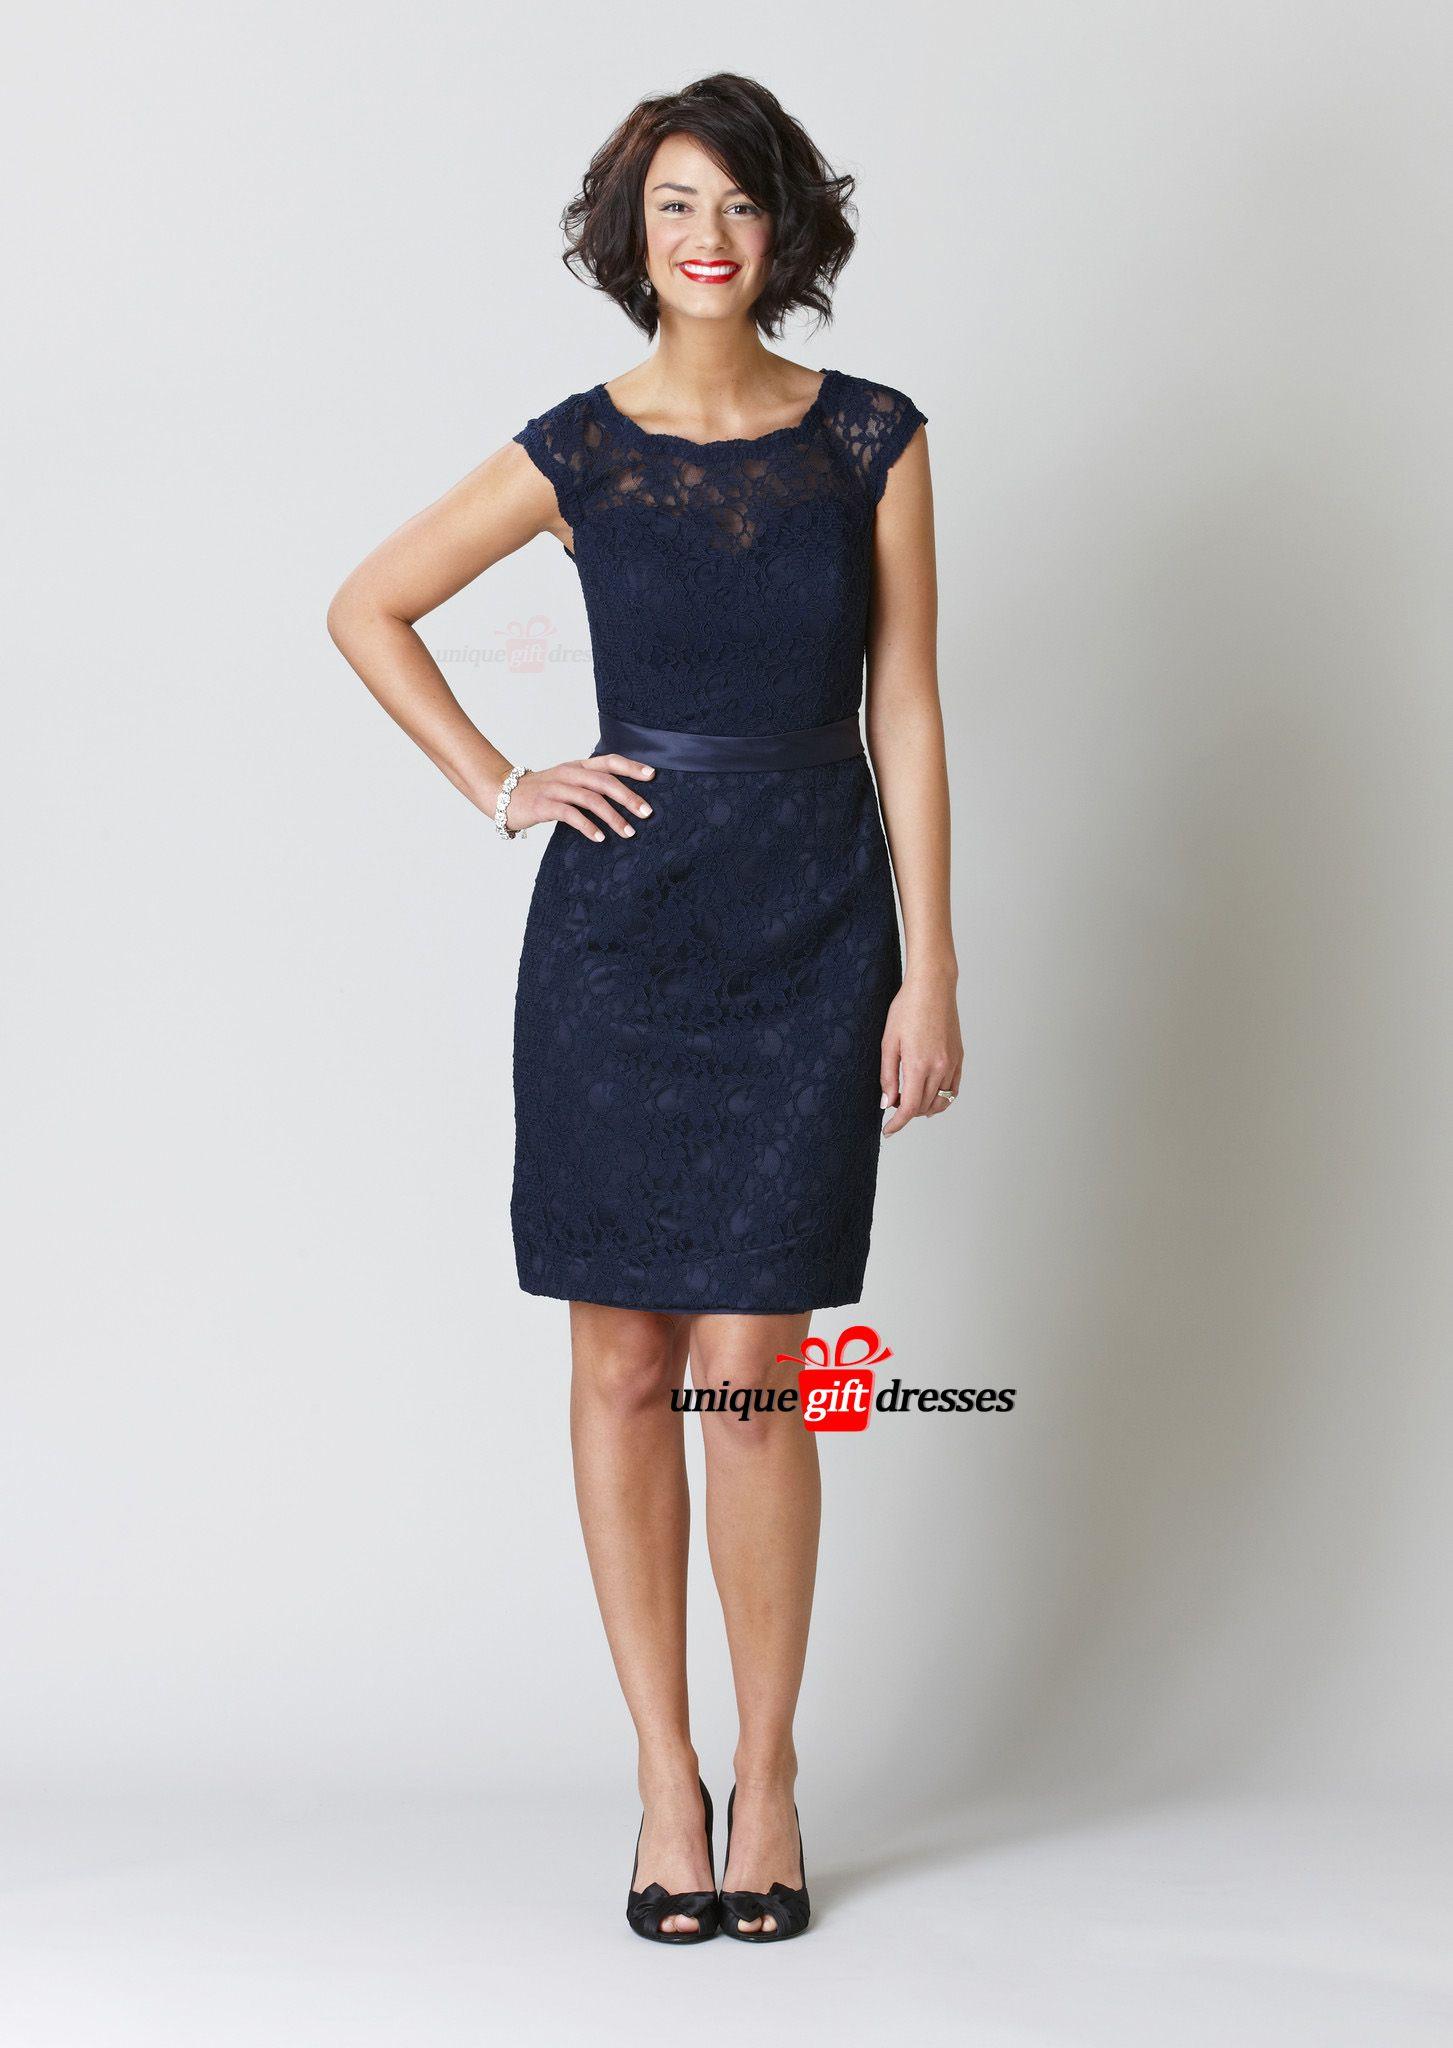 Dark Navy Jewel Knee Length Lace Bridesmaid Dresses Party